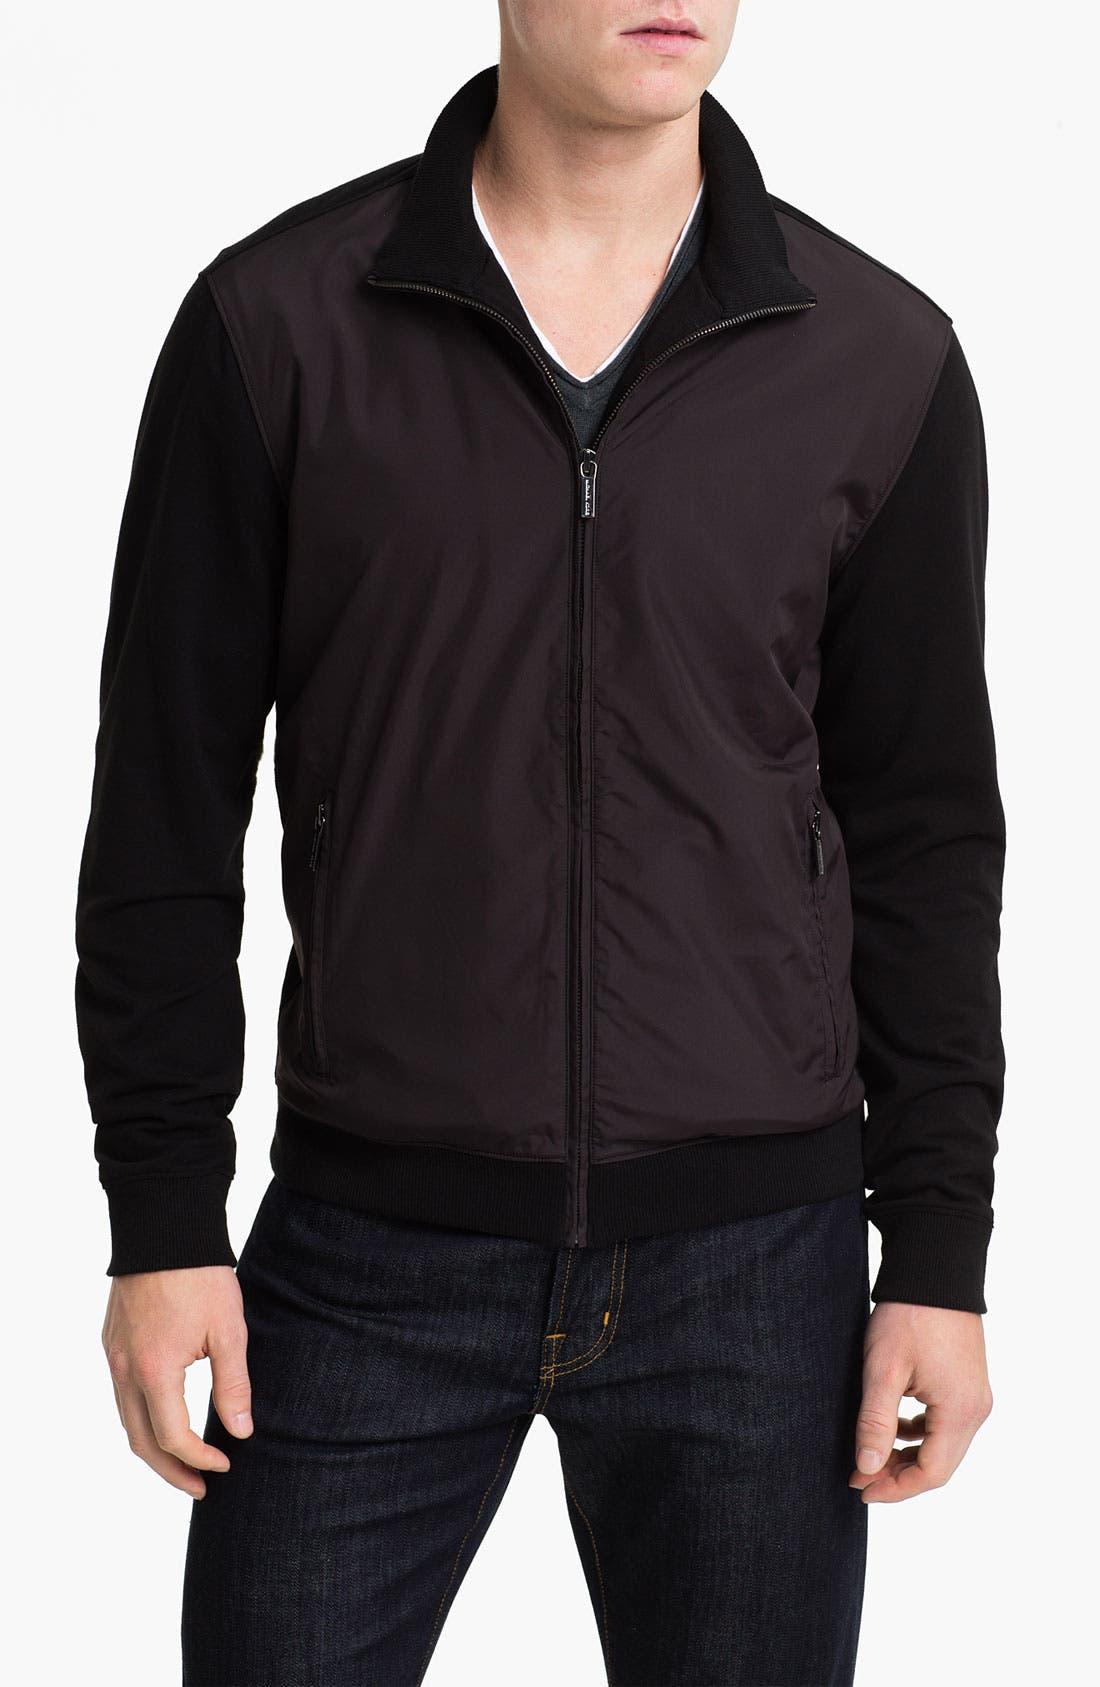 Alternate Image 1 Selected - Michael Kors Zip Front Jacket